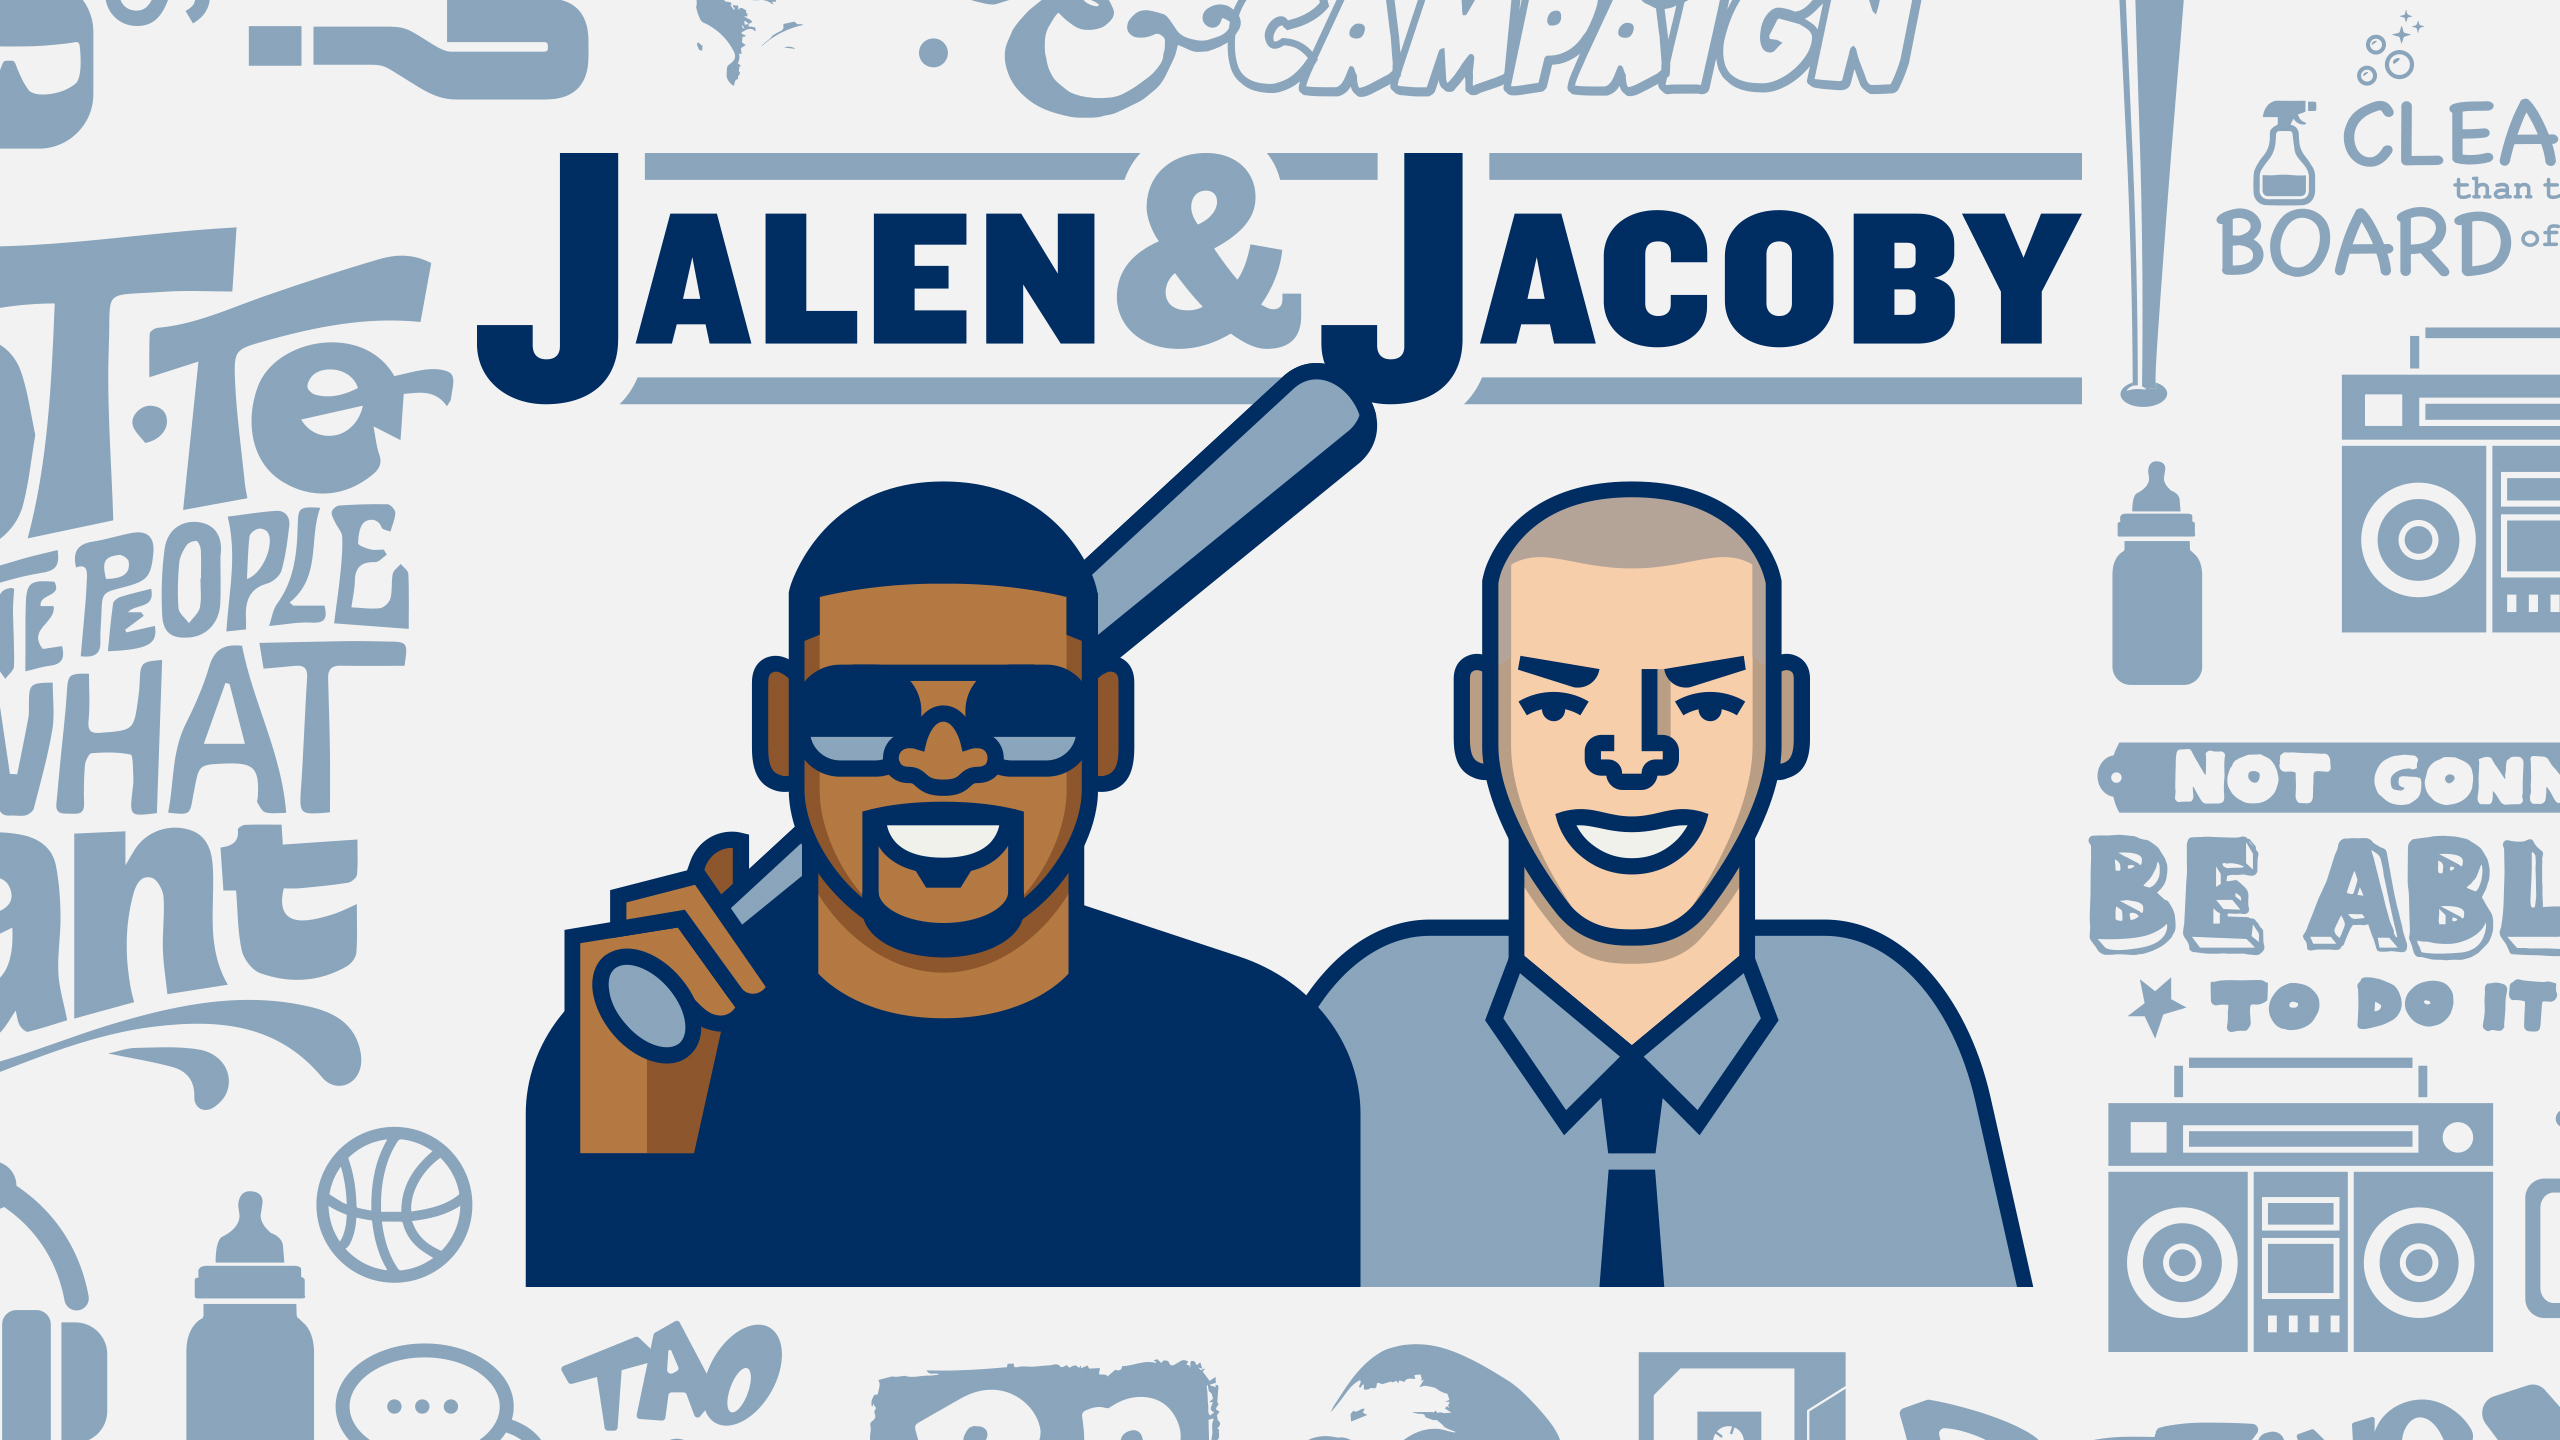 Mon, 12/17 - Jalen & Jacoby